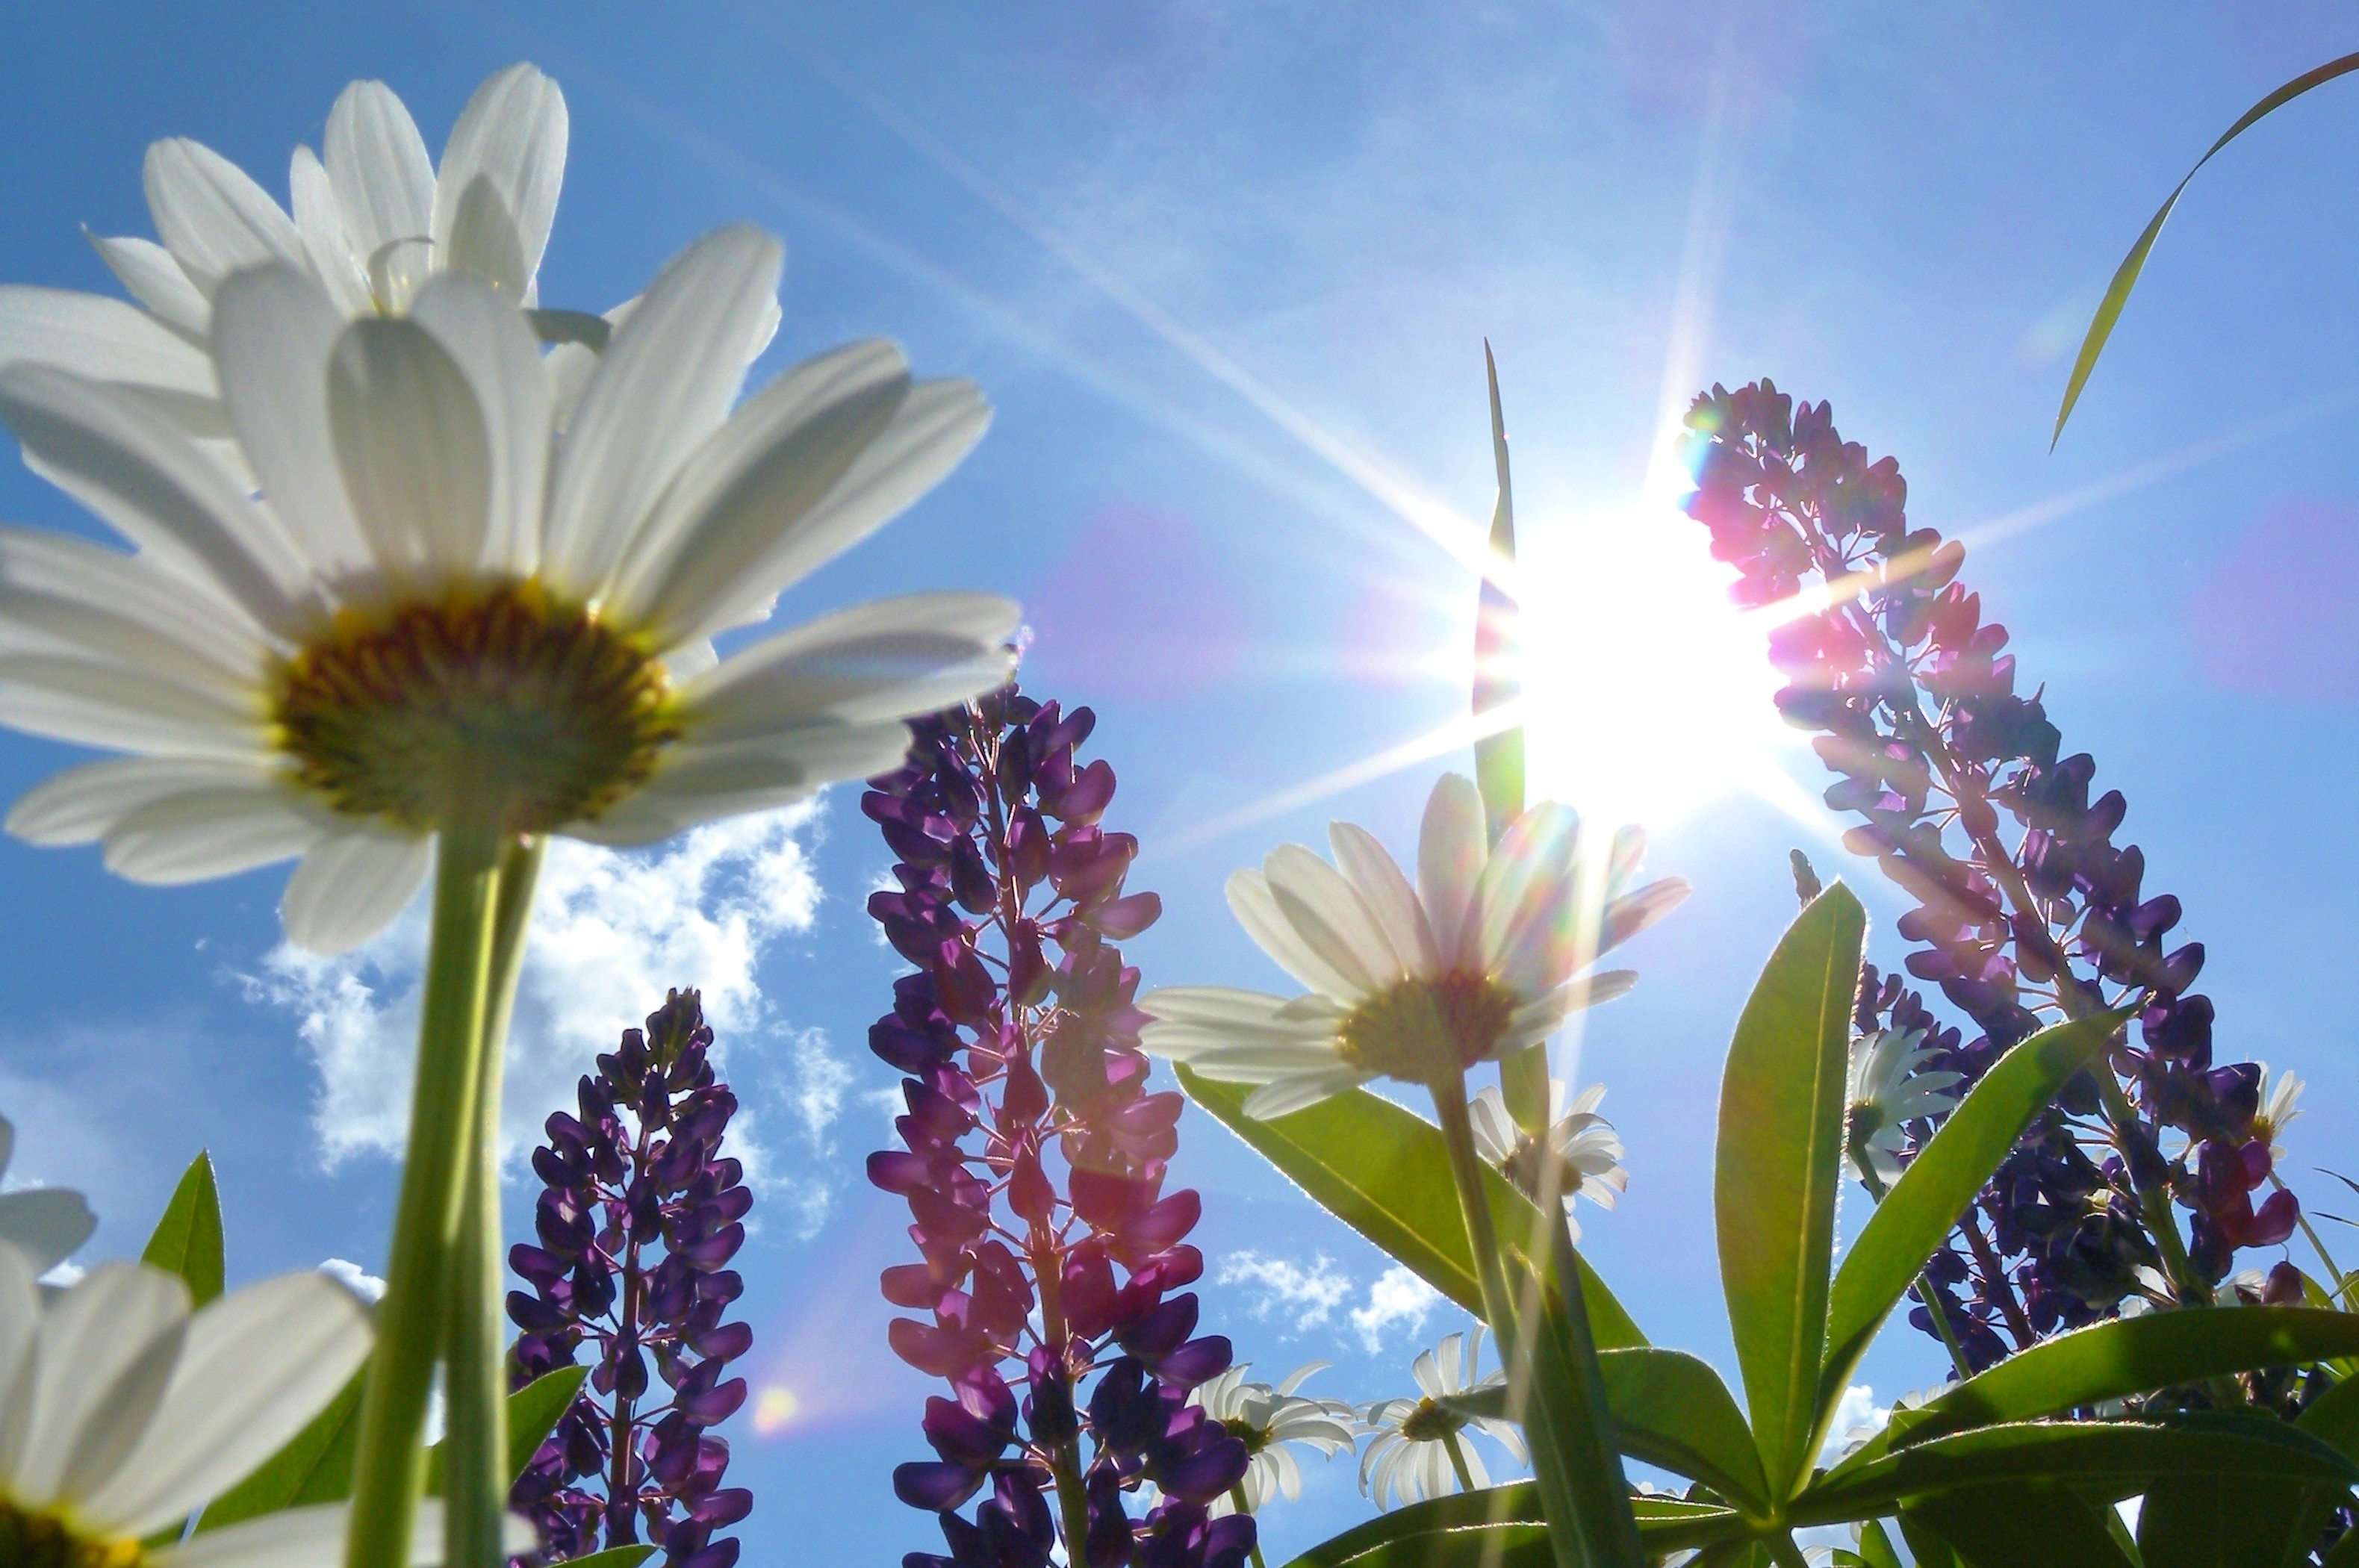 Image: Sun through flowers